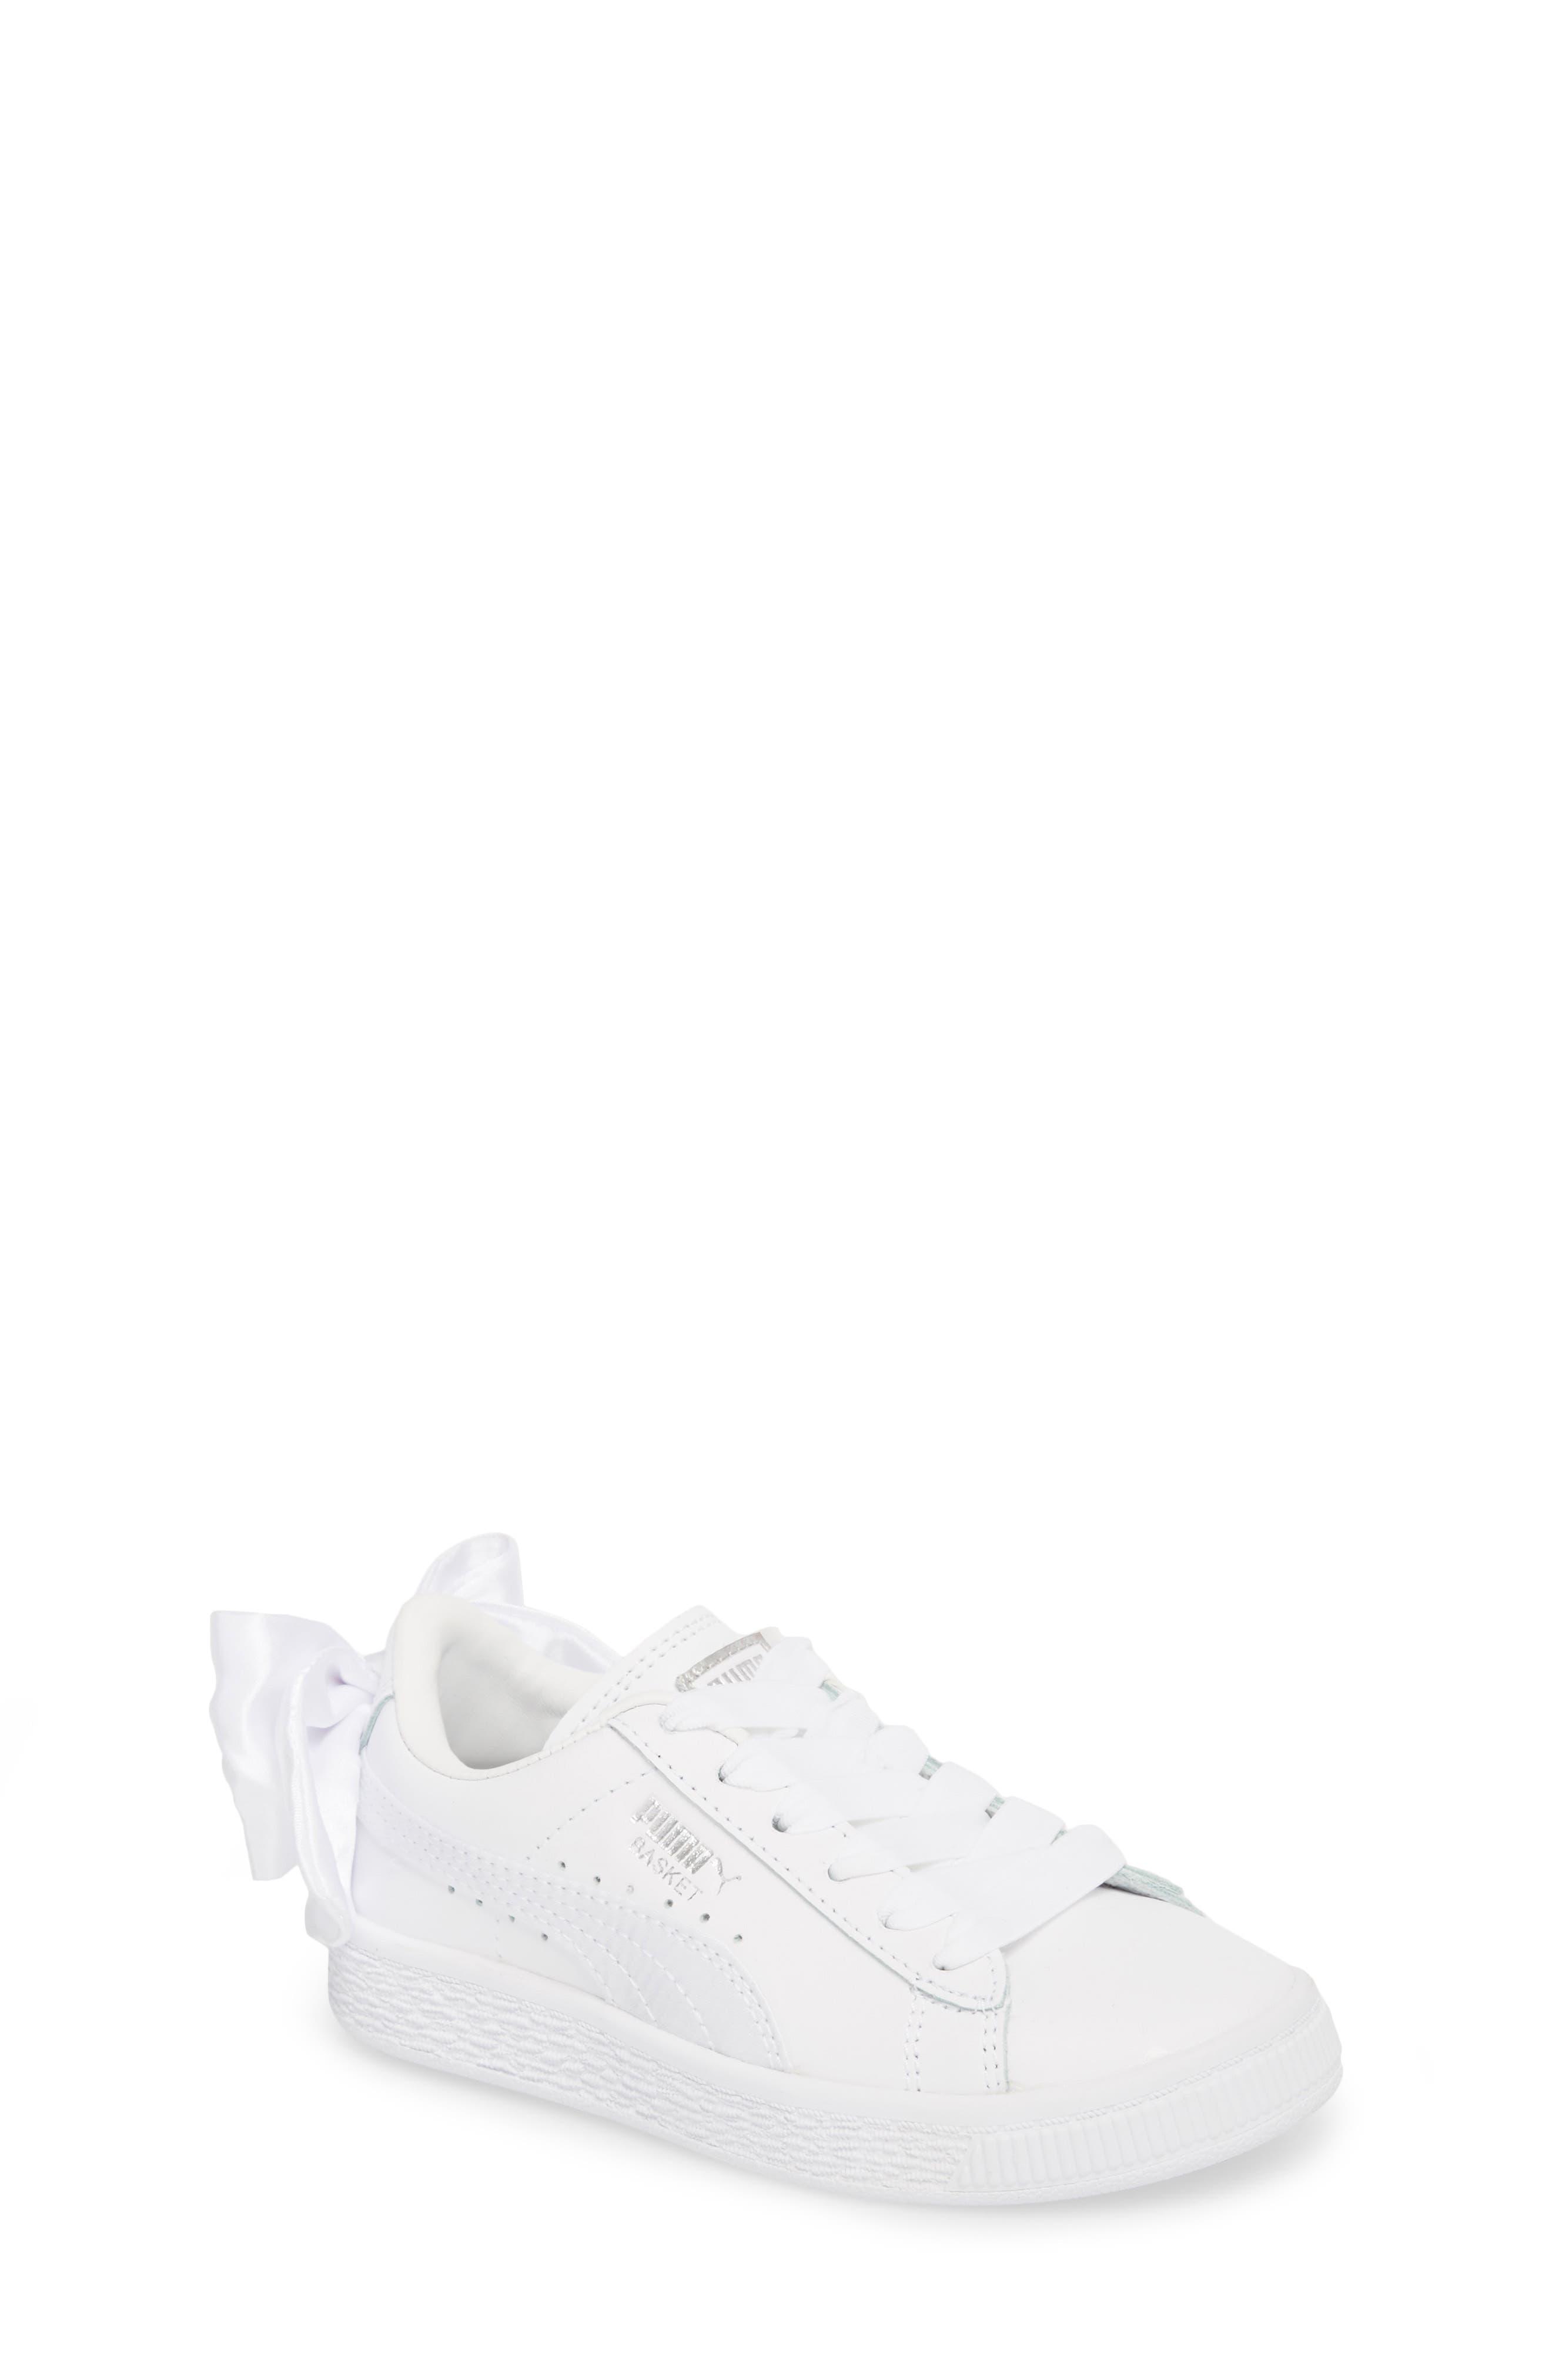 Basket Bow AC Sneaker,                         Main,                         color, 100